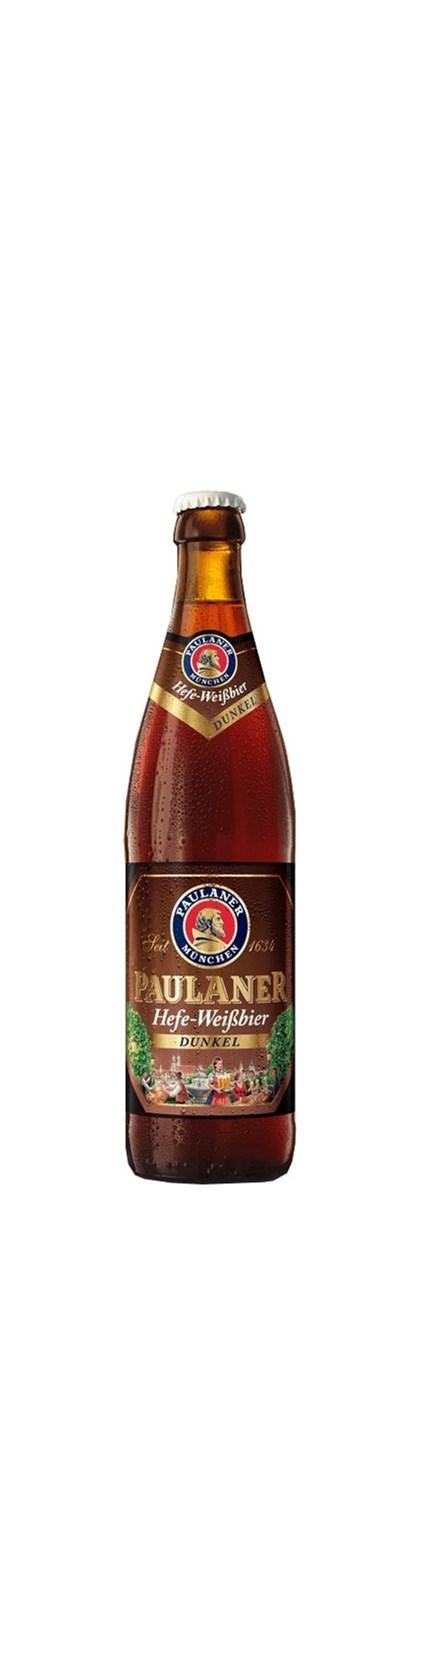 Paulaner Hefe Weiss Dunkel 500ml